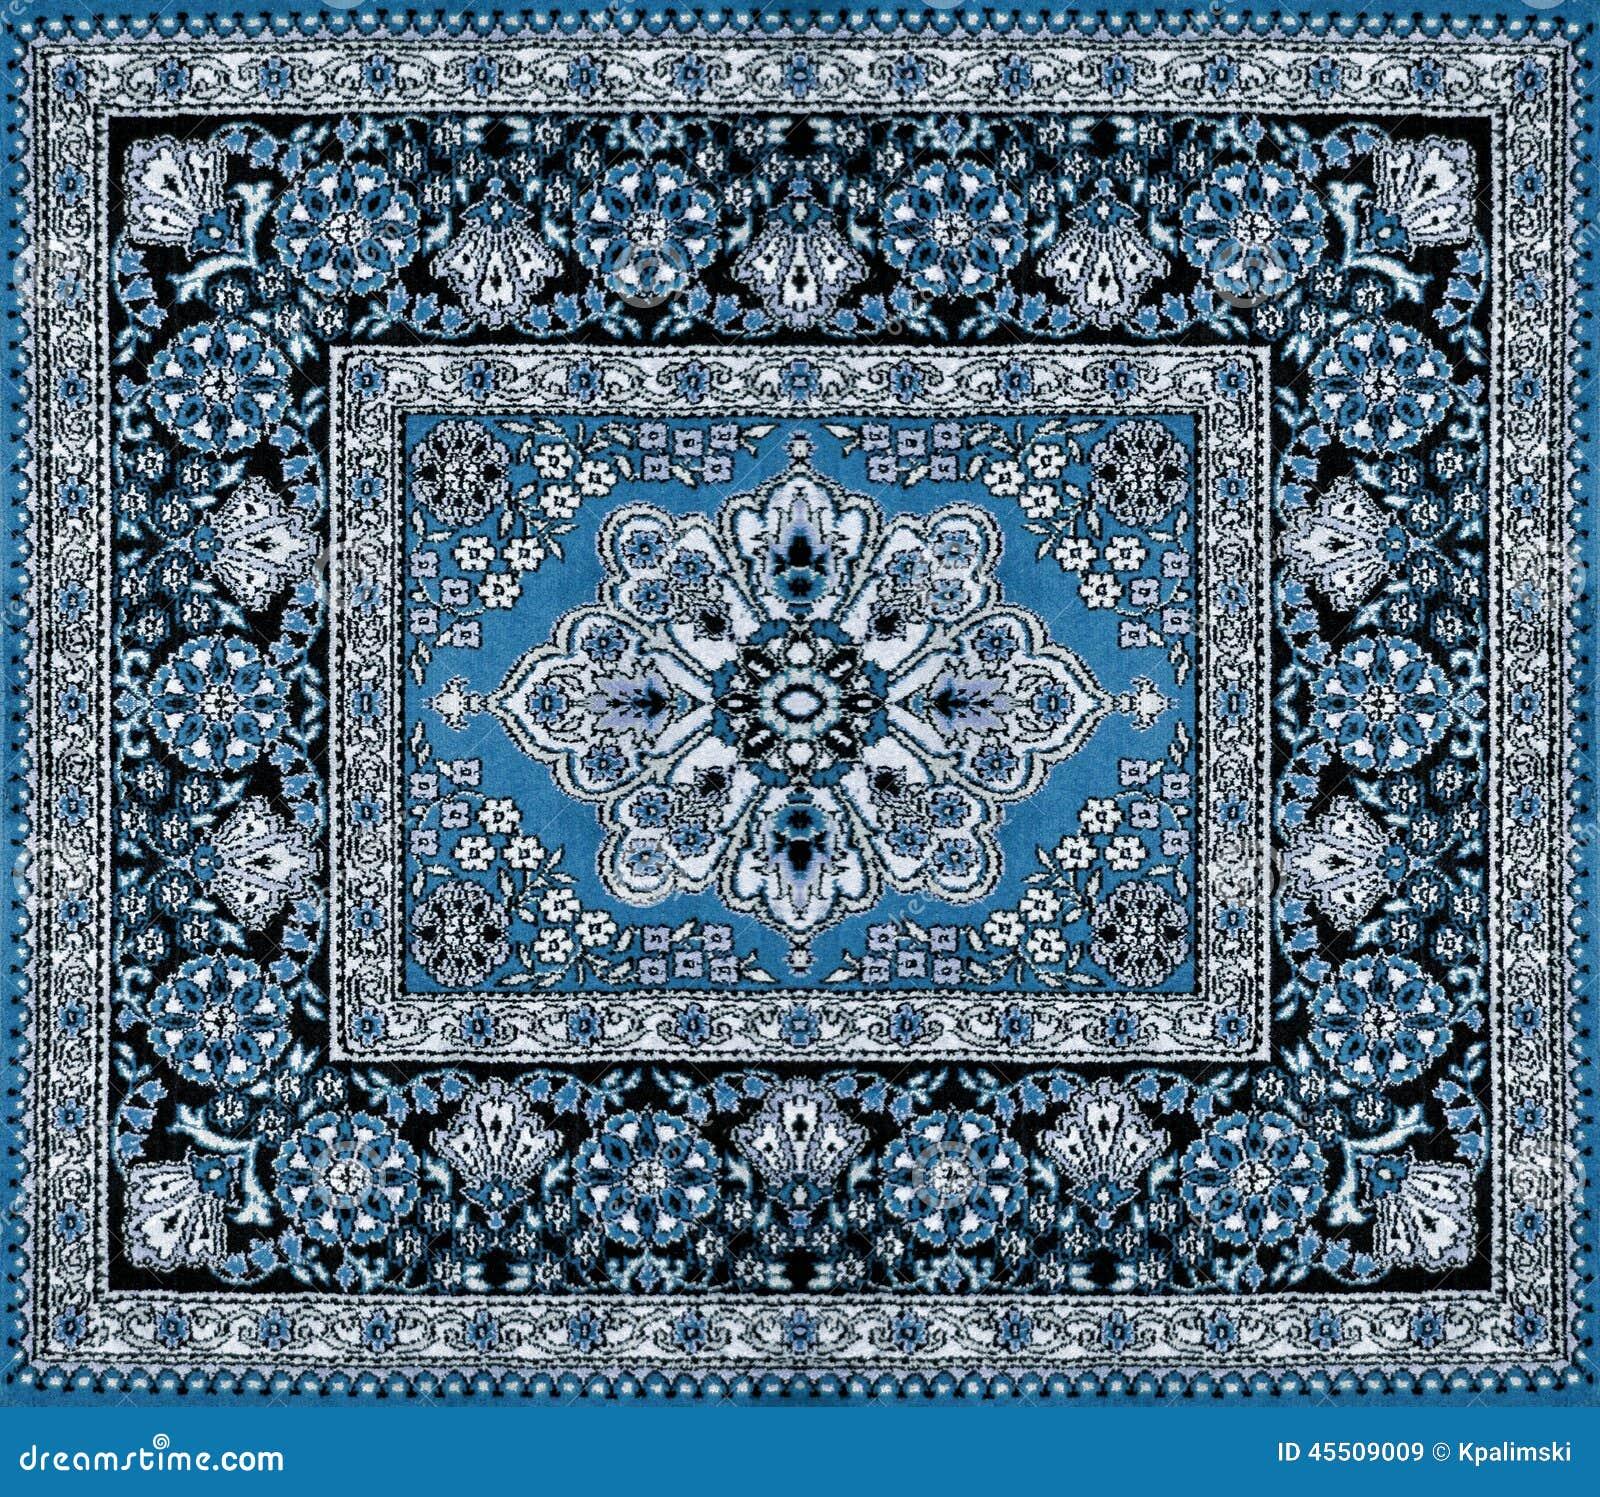 Fabuleux Tapis de Perse bleu-foncé image stock. Image du luxe - 45509009 CF38